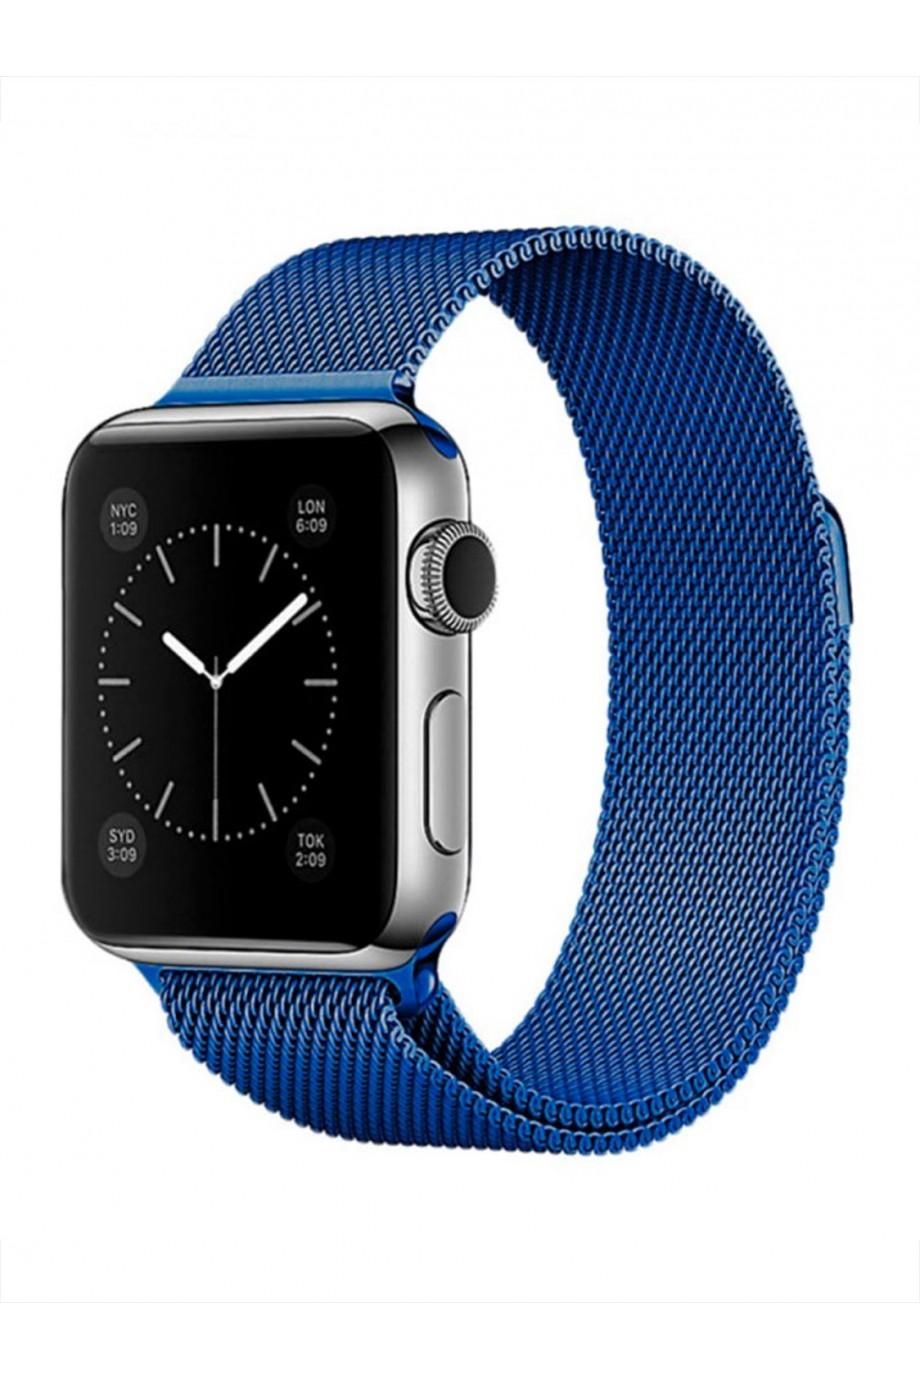 Металлический ремешок для Apple Watch 3 42 мм, синий